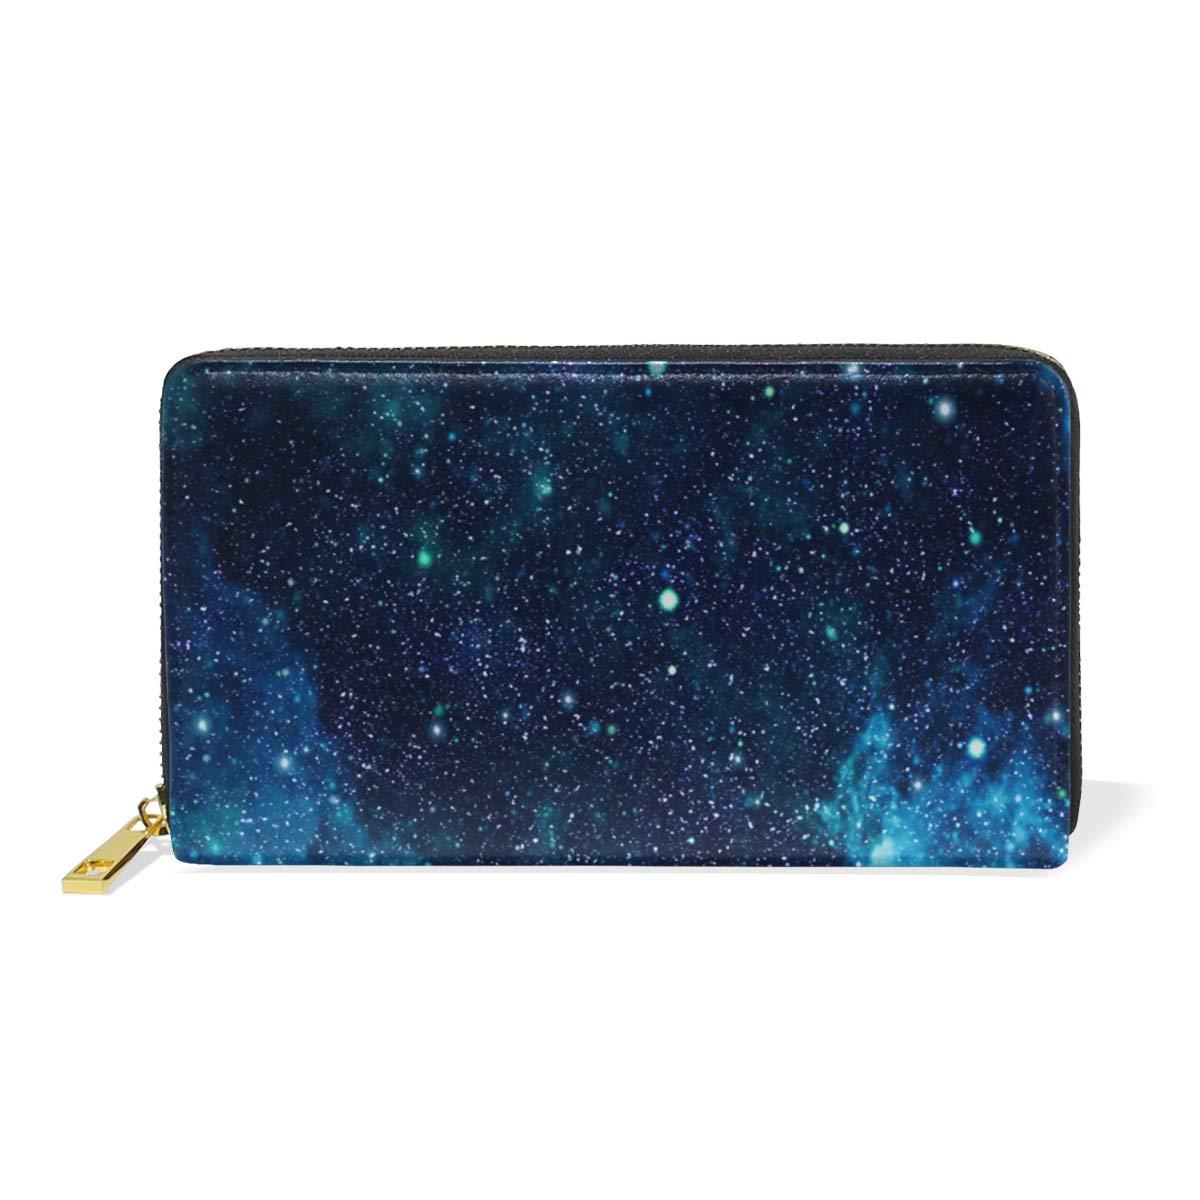 Womens Wallets Glittering Starry Sky Universe Leather Passport Wallet Coin Purse Girls Handbags